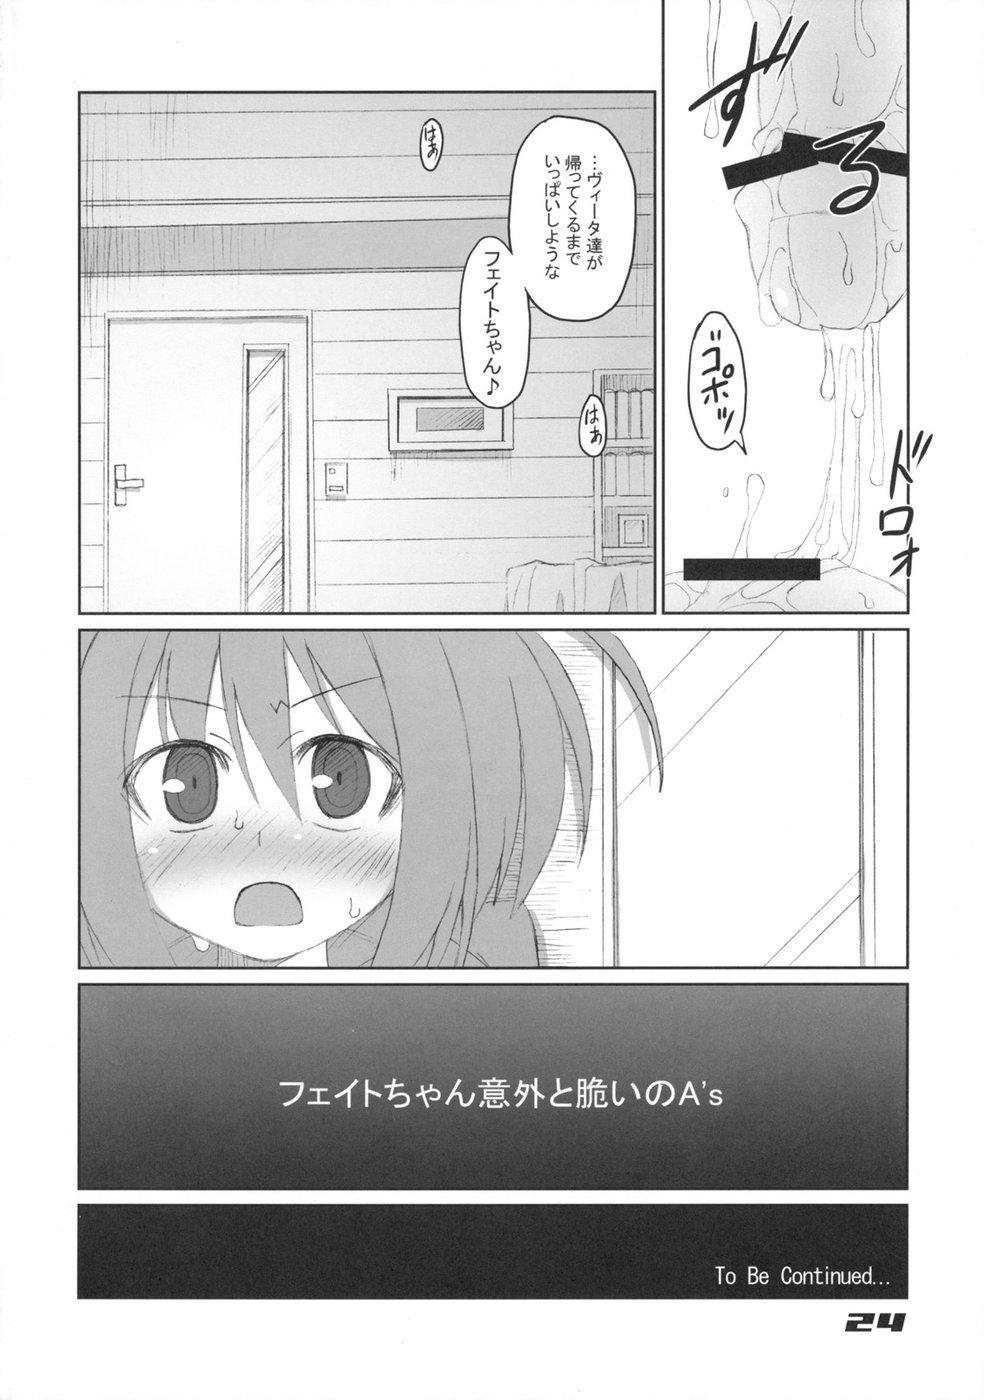 Fate-chan Igai to Moroi no A's 23